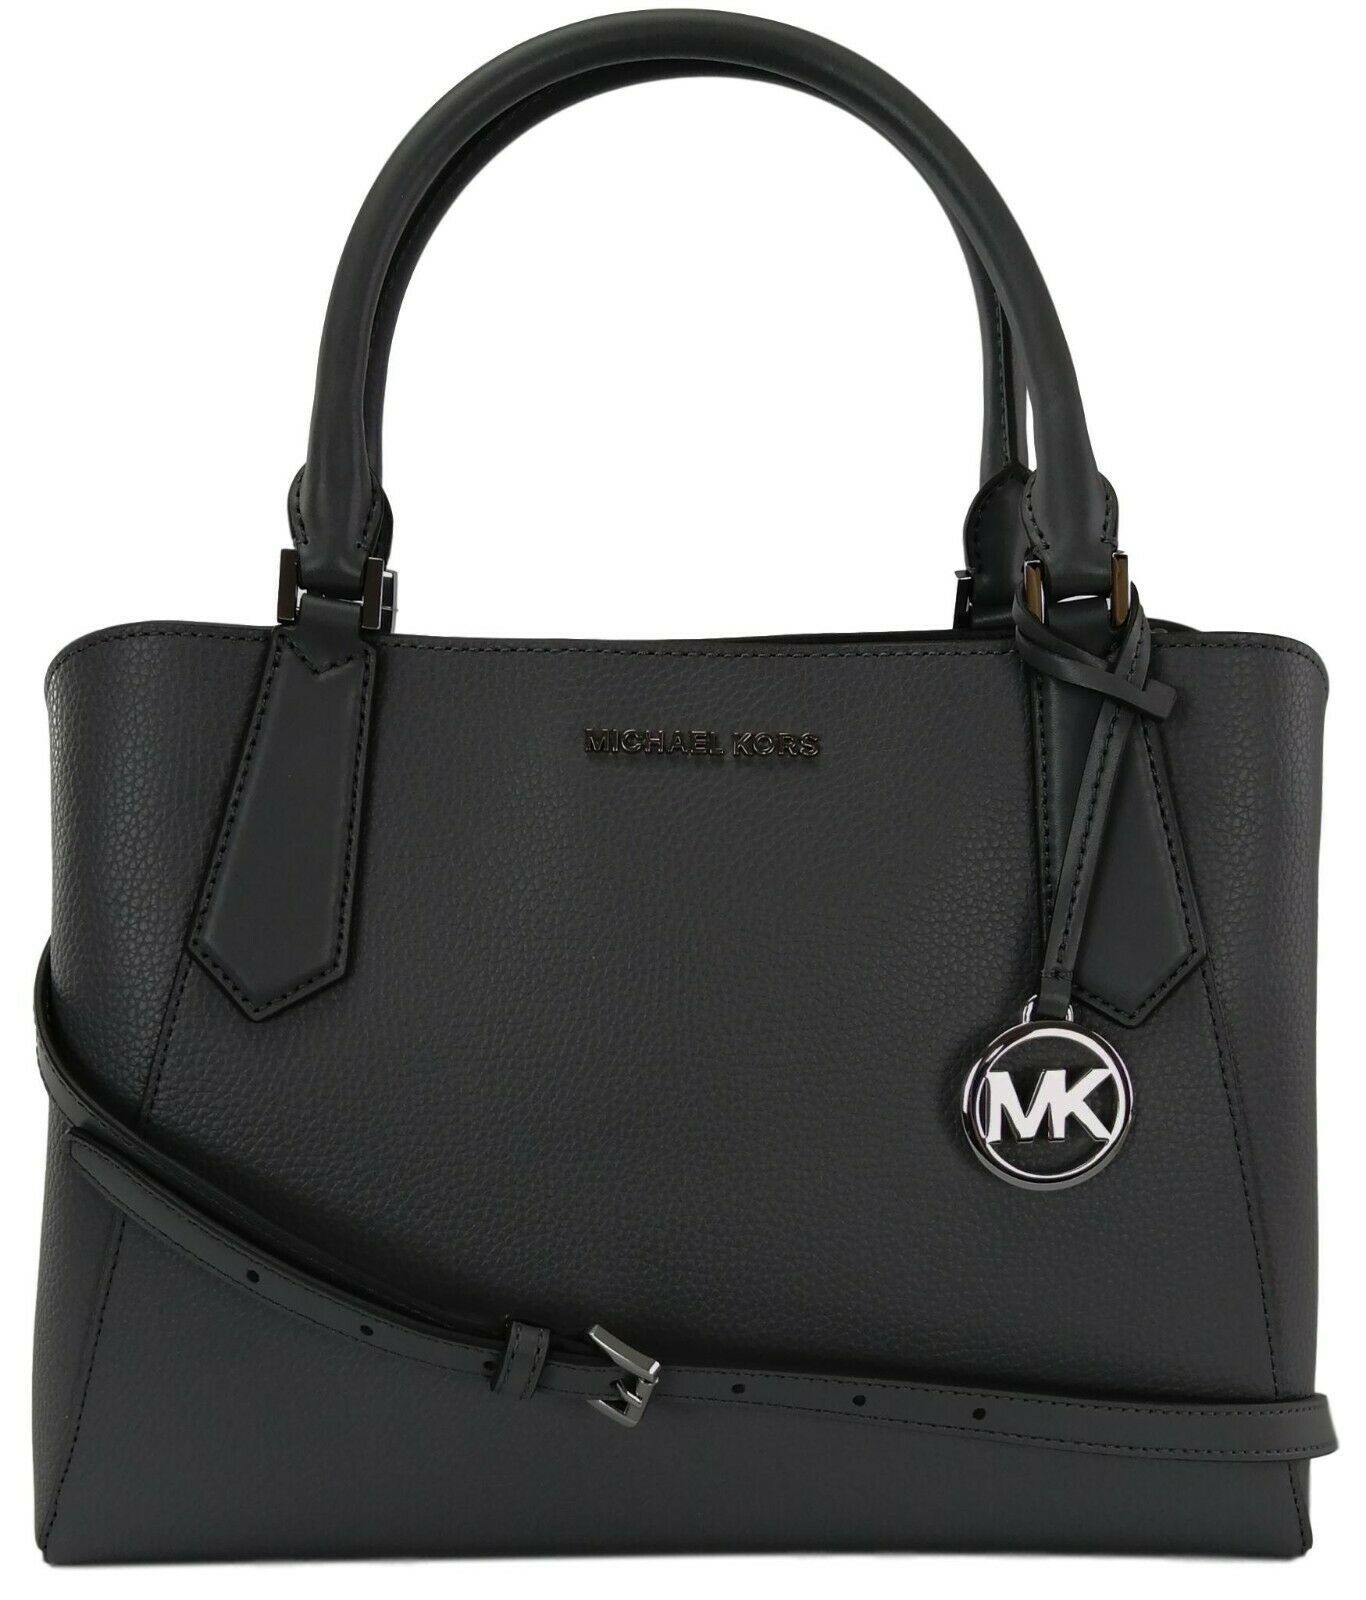 Michael Kors Satchel Top Handle Heather Grey Leather Kimberly Bag - $393.86